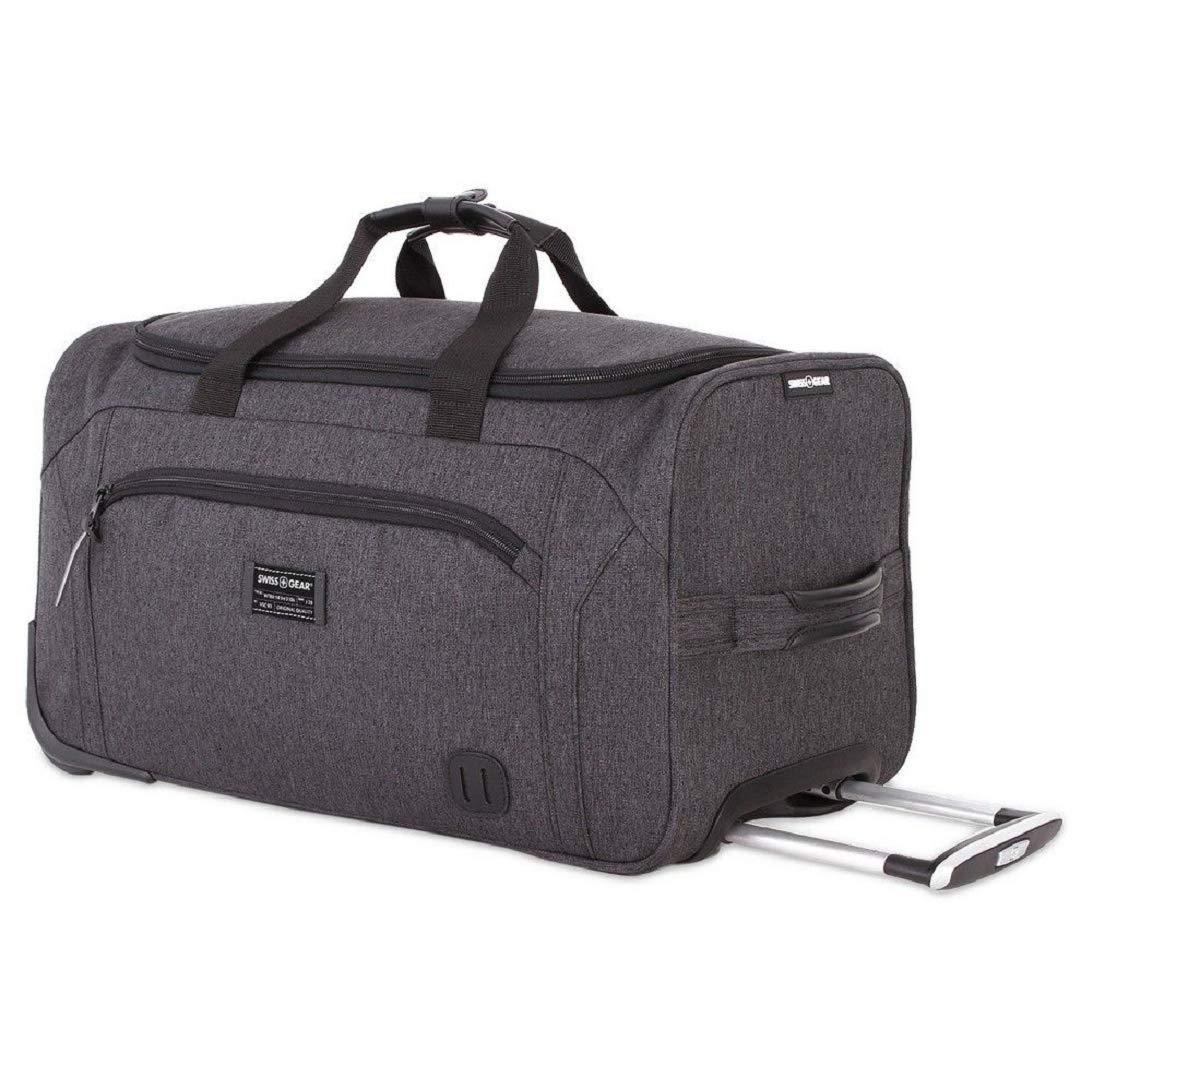 4cc63943c081 SWISSGEAR Getaway Weekend Wheeled 19-inch Duffel Bag   Rolling ...